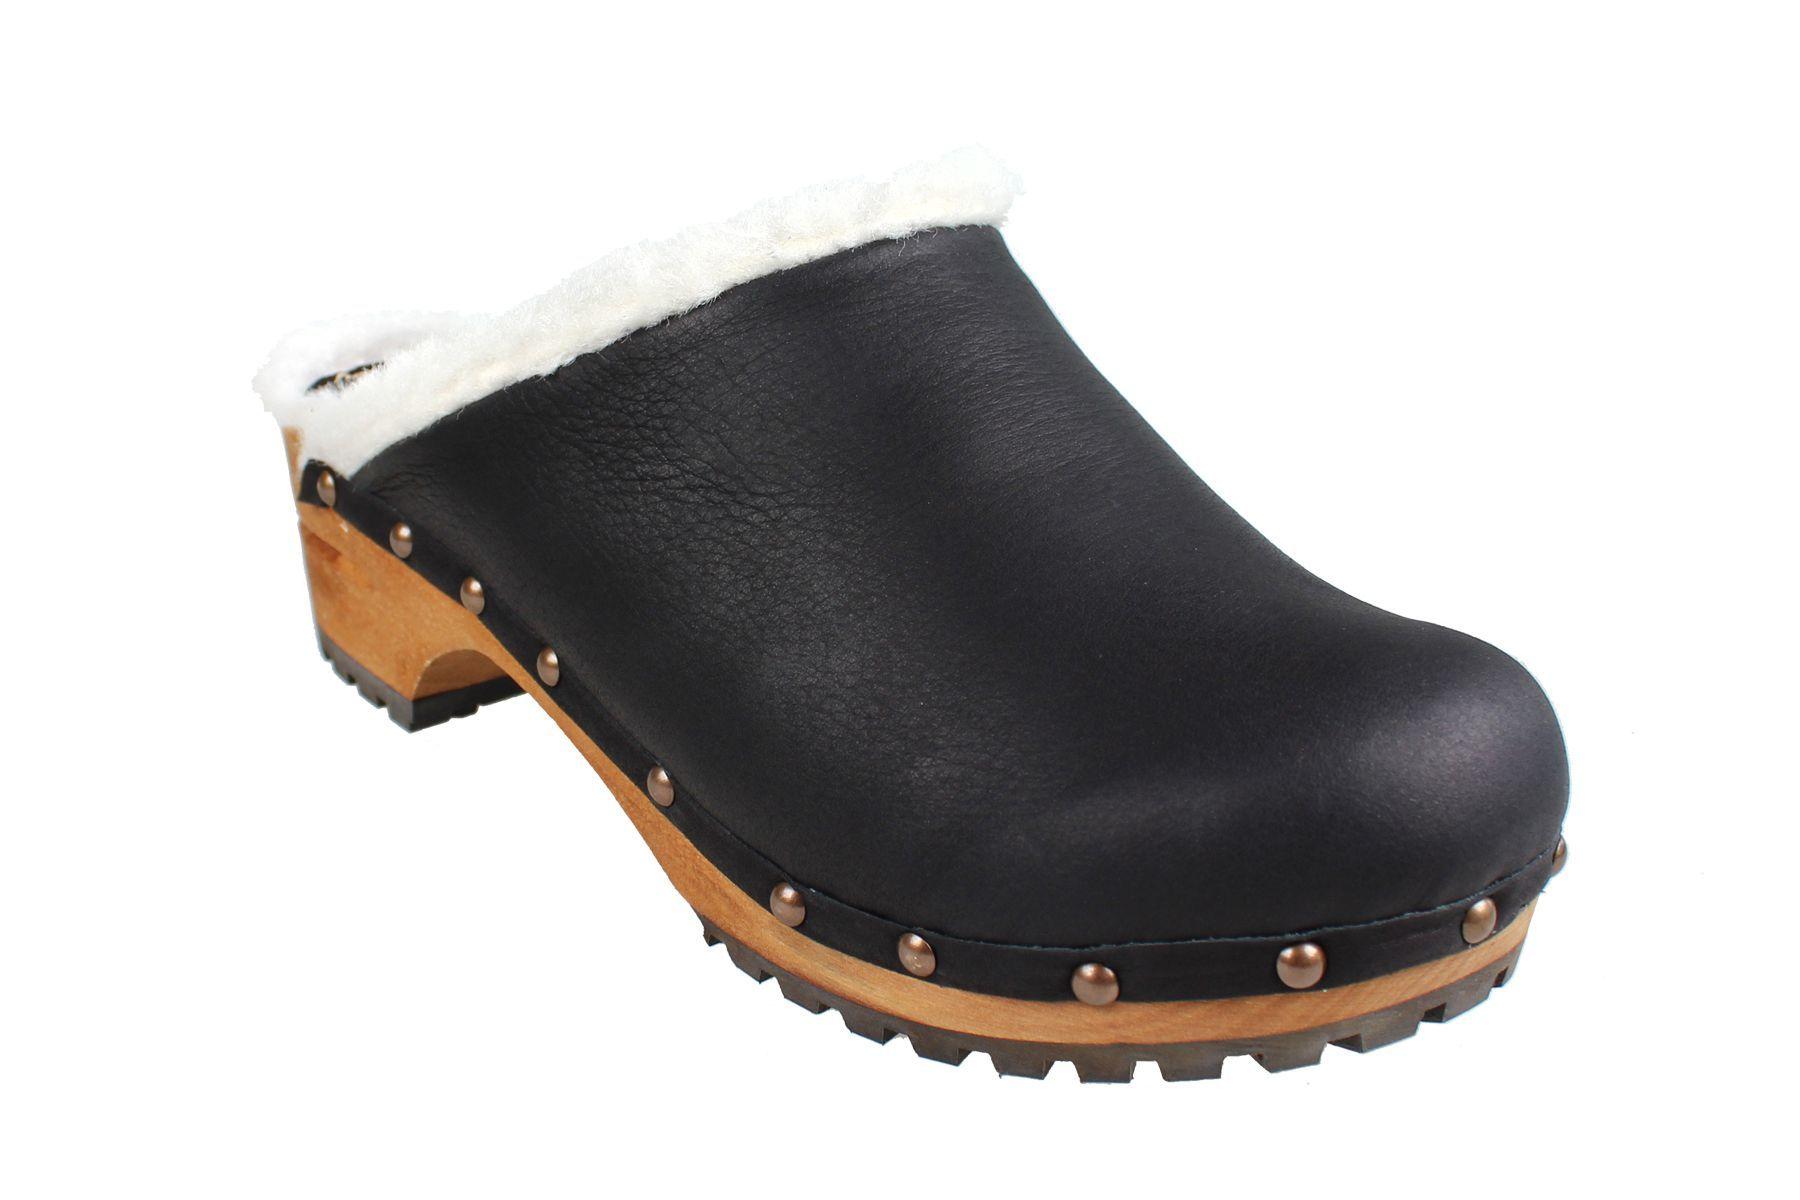 Sanita Hese Wooden Clog with shearling fur in Yak Nubuck Leather Black